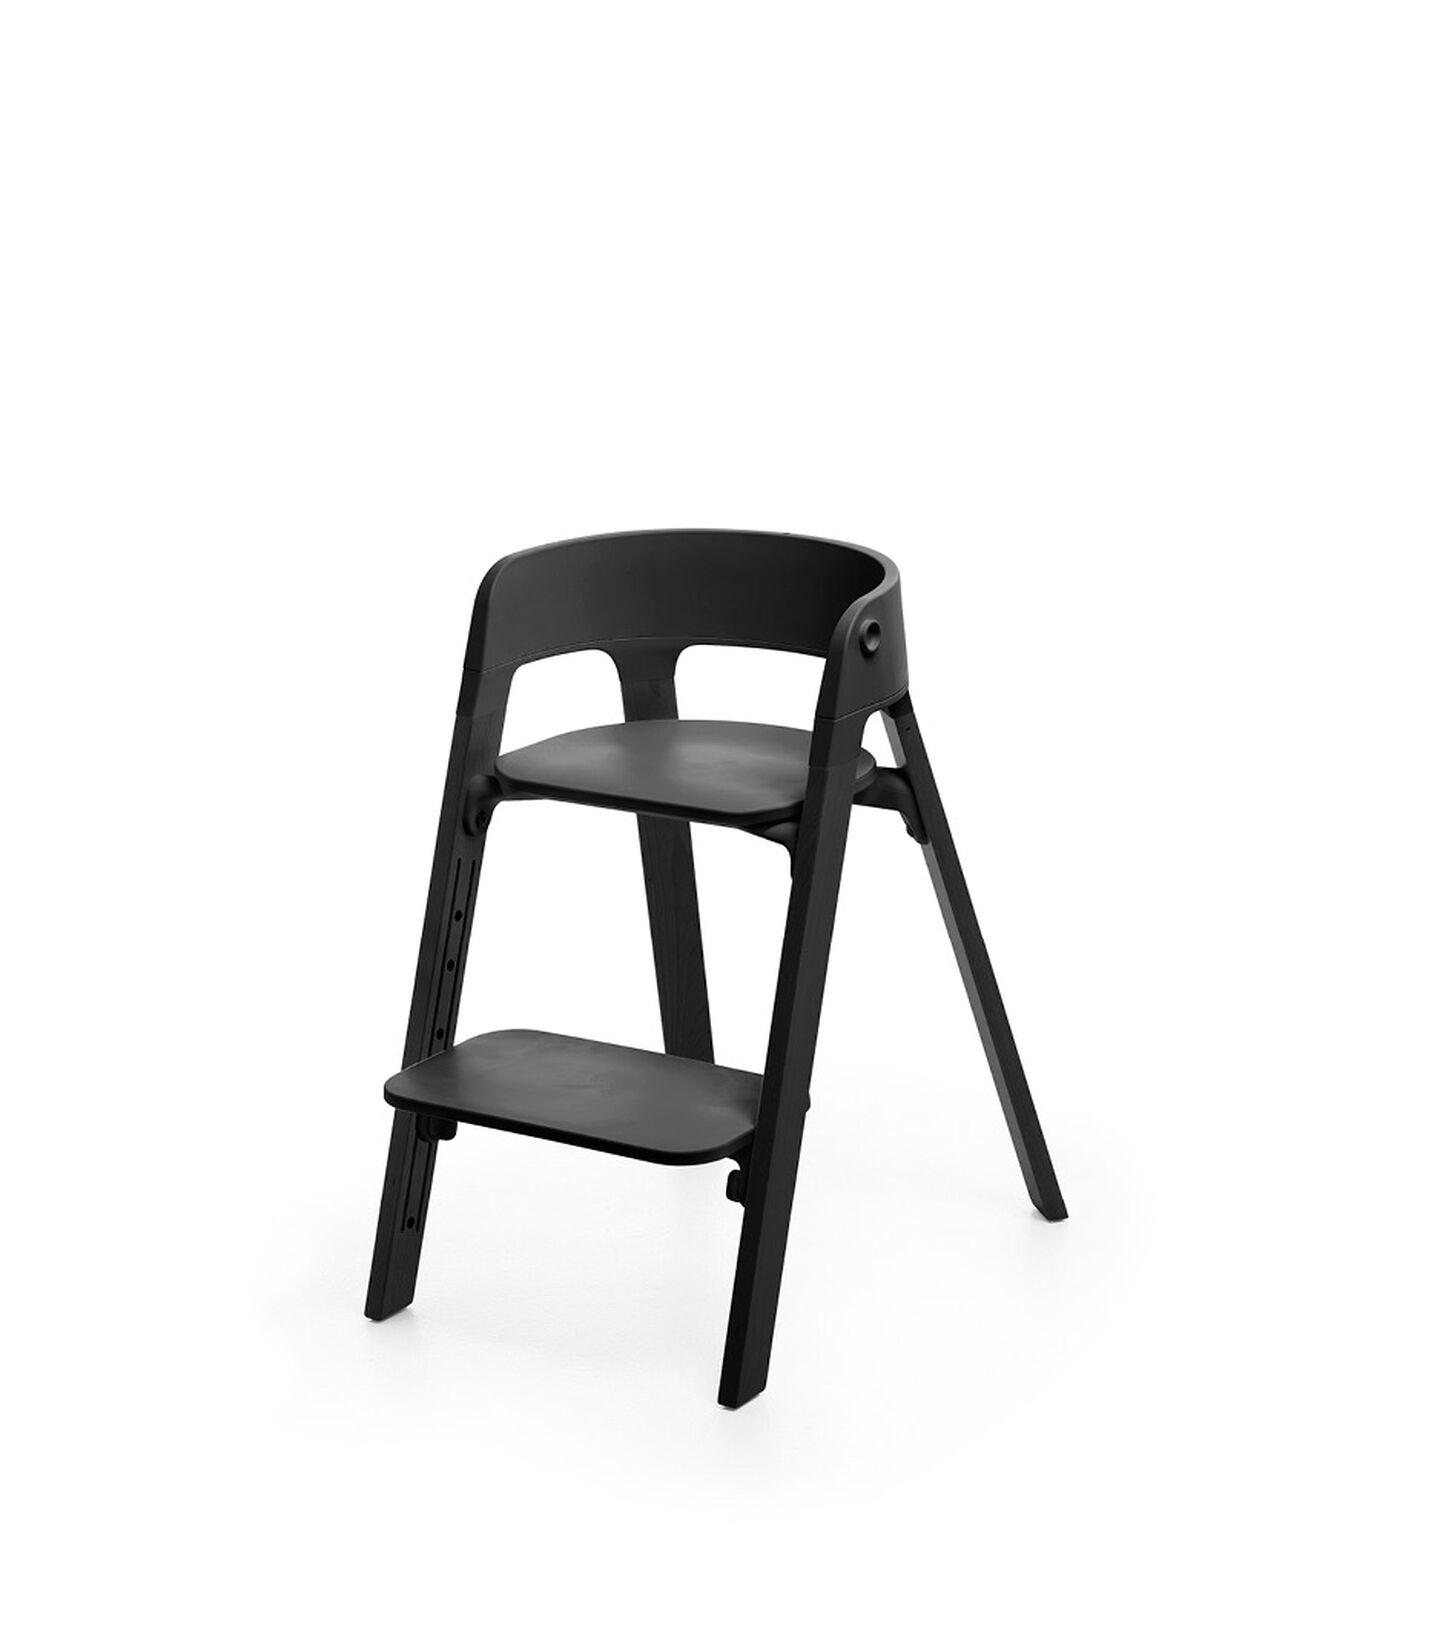 Stokke® Steps™ Stuhl Black, Black, mainview view 1